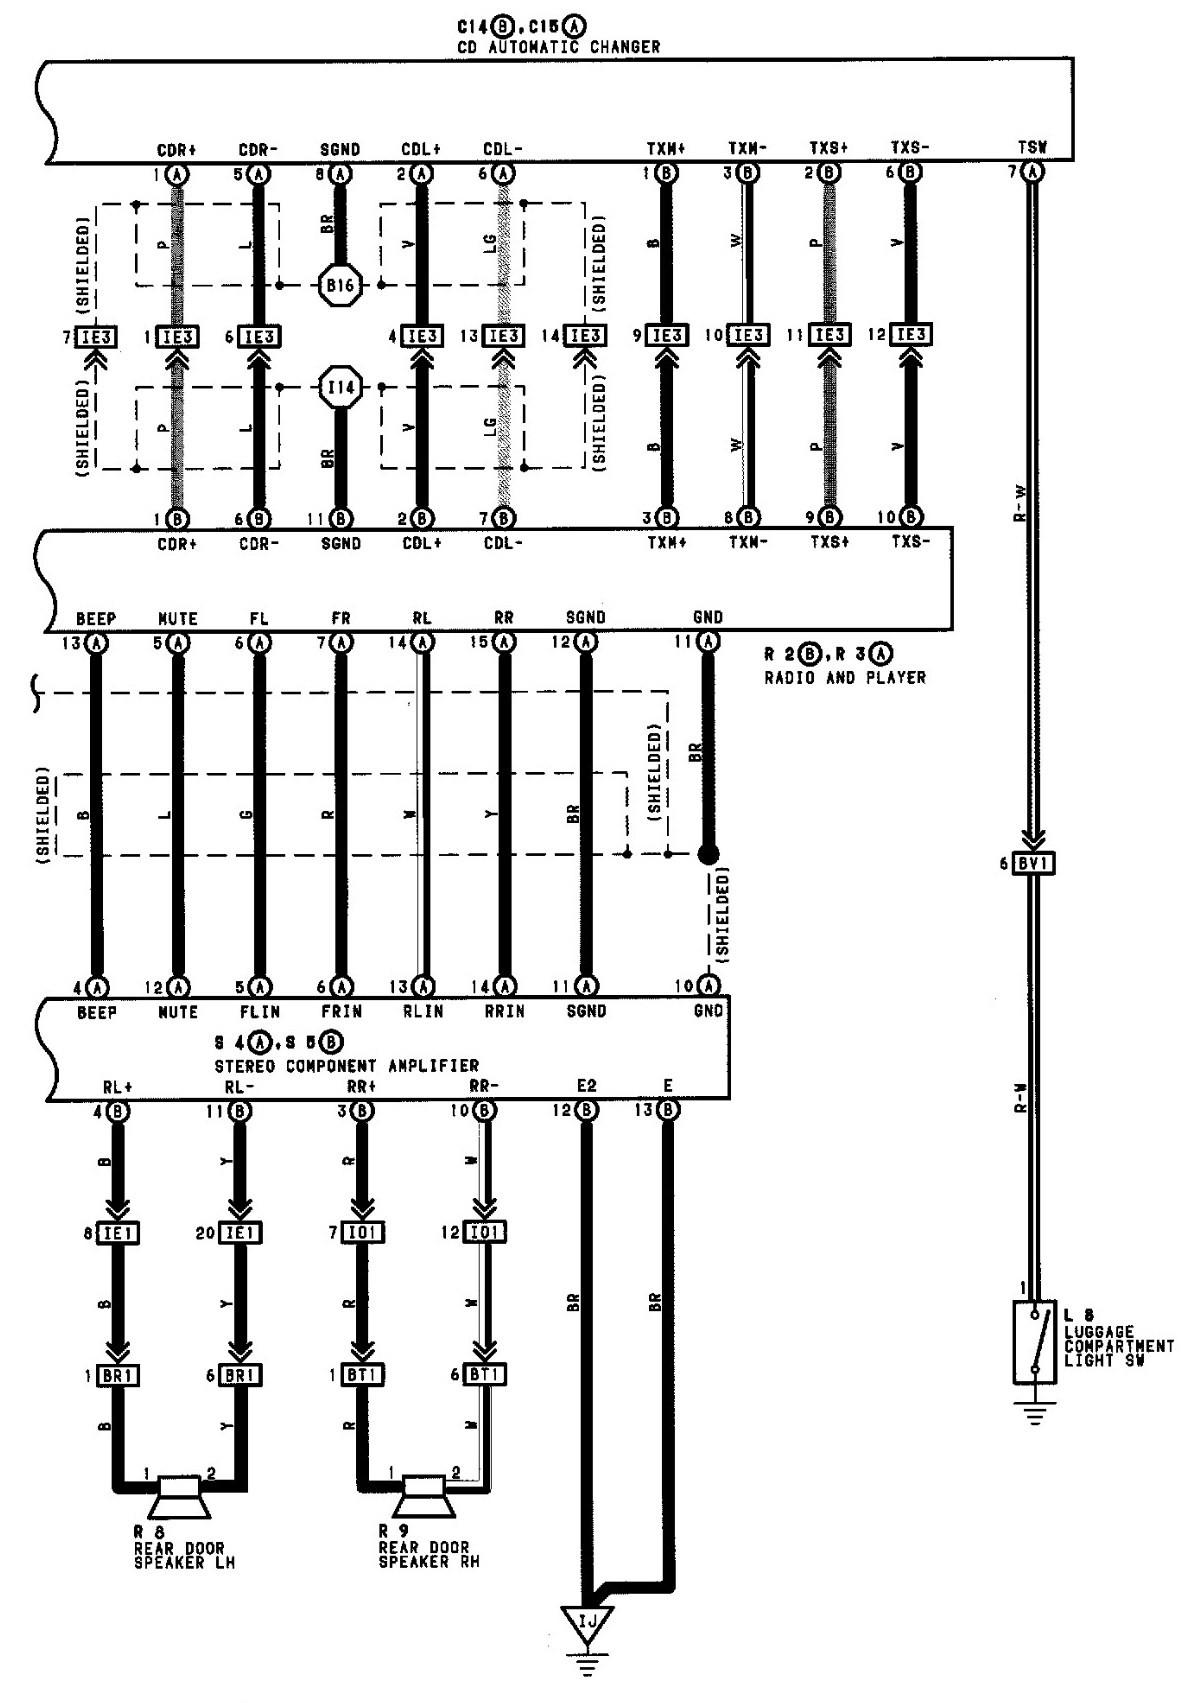 1997 toyota camry engine diagram